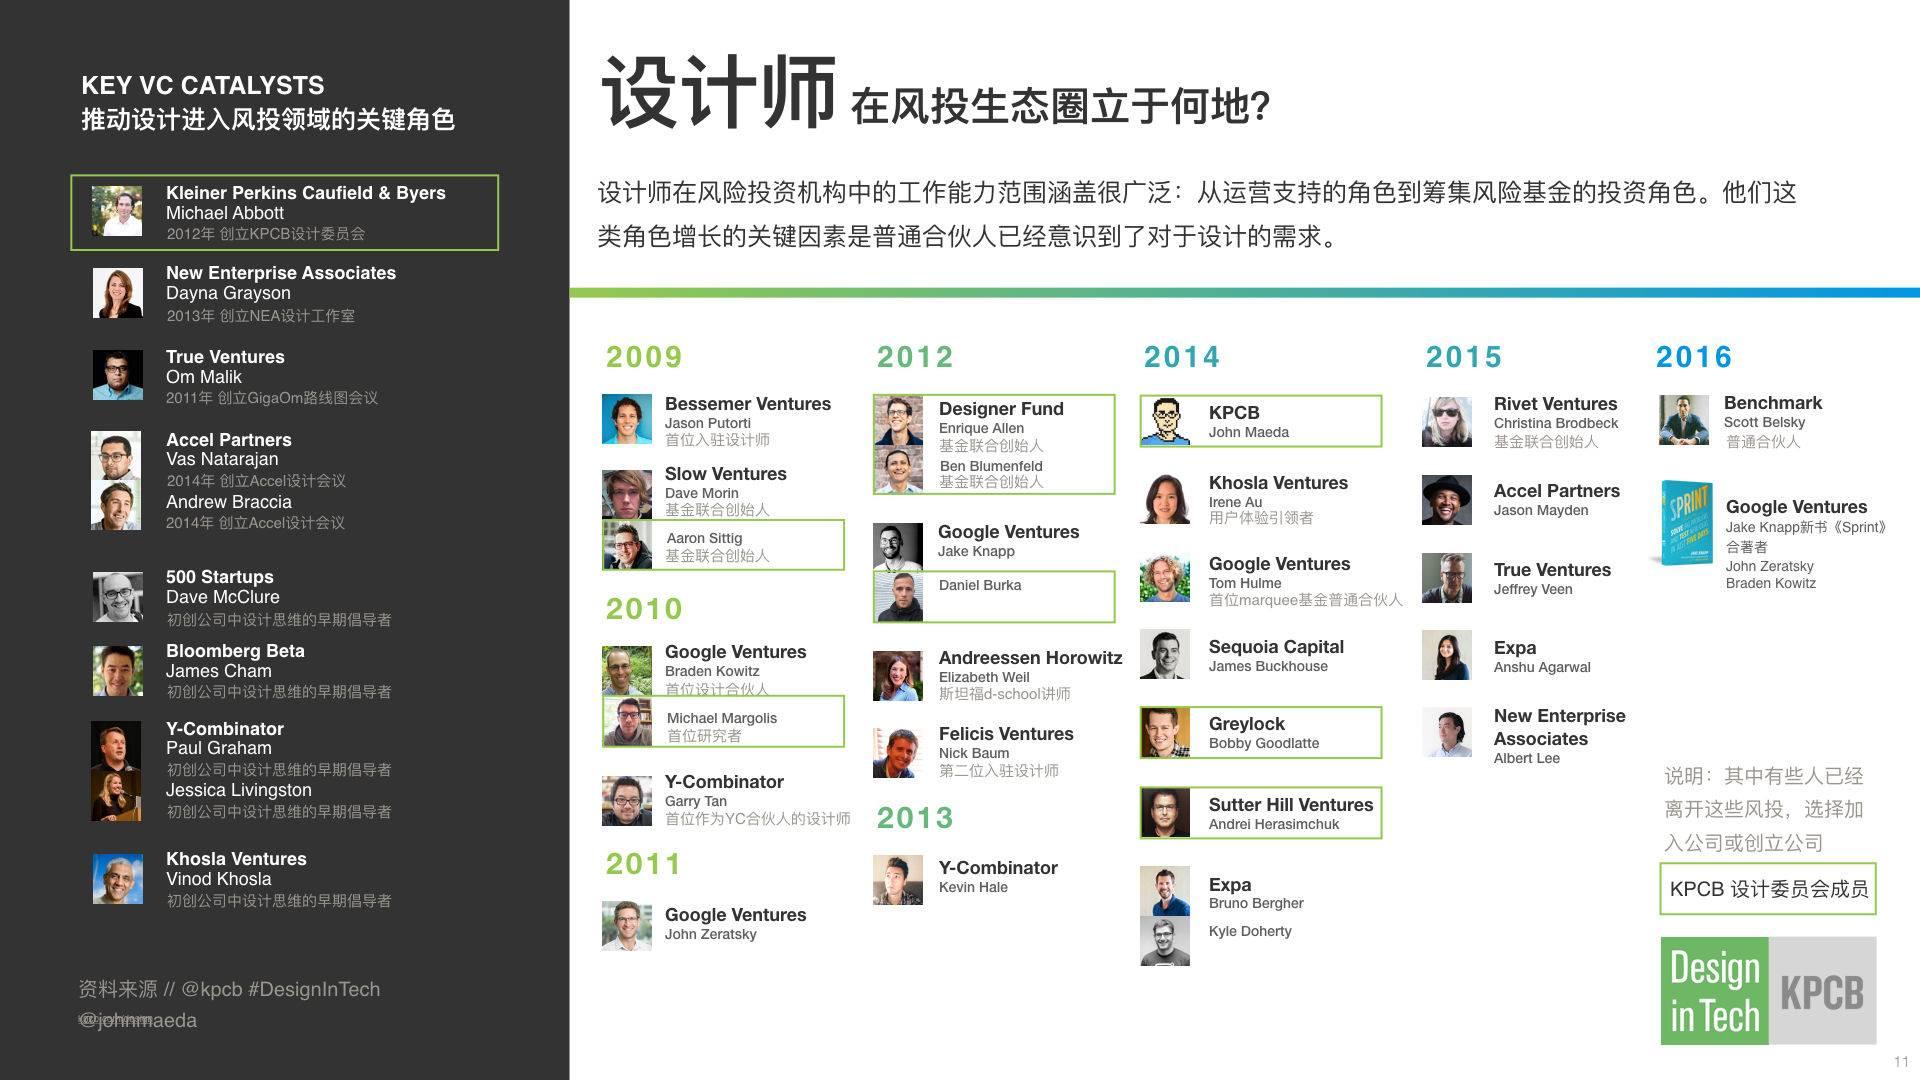 2016DesignInTech科技中的设计(Chinese).011.jpeg